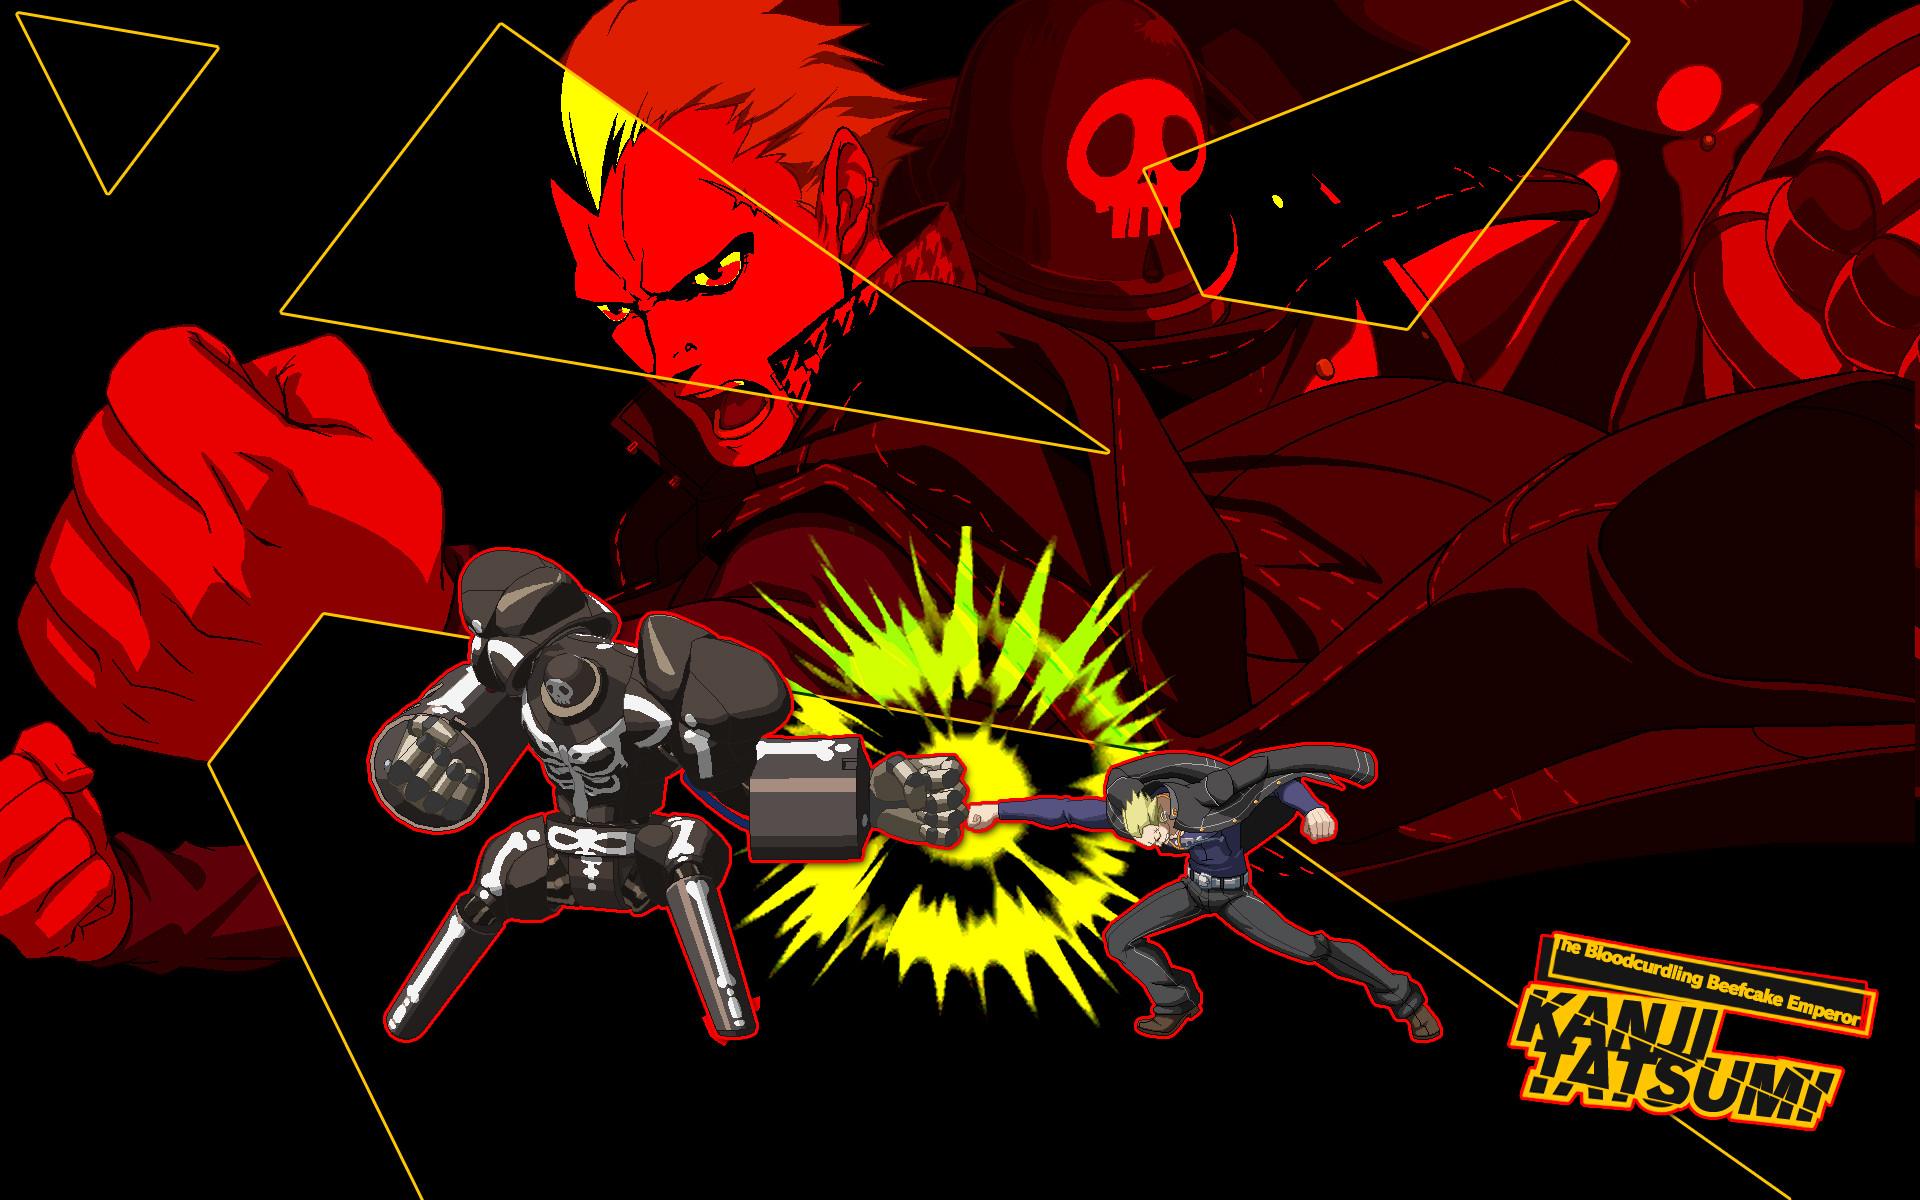 … Kanji – Persona 4 Arena HD Wallpaper for PC / PS3 by seraharcana